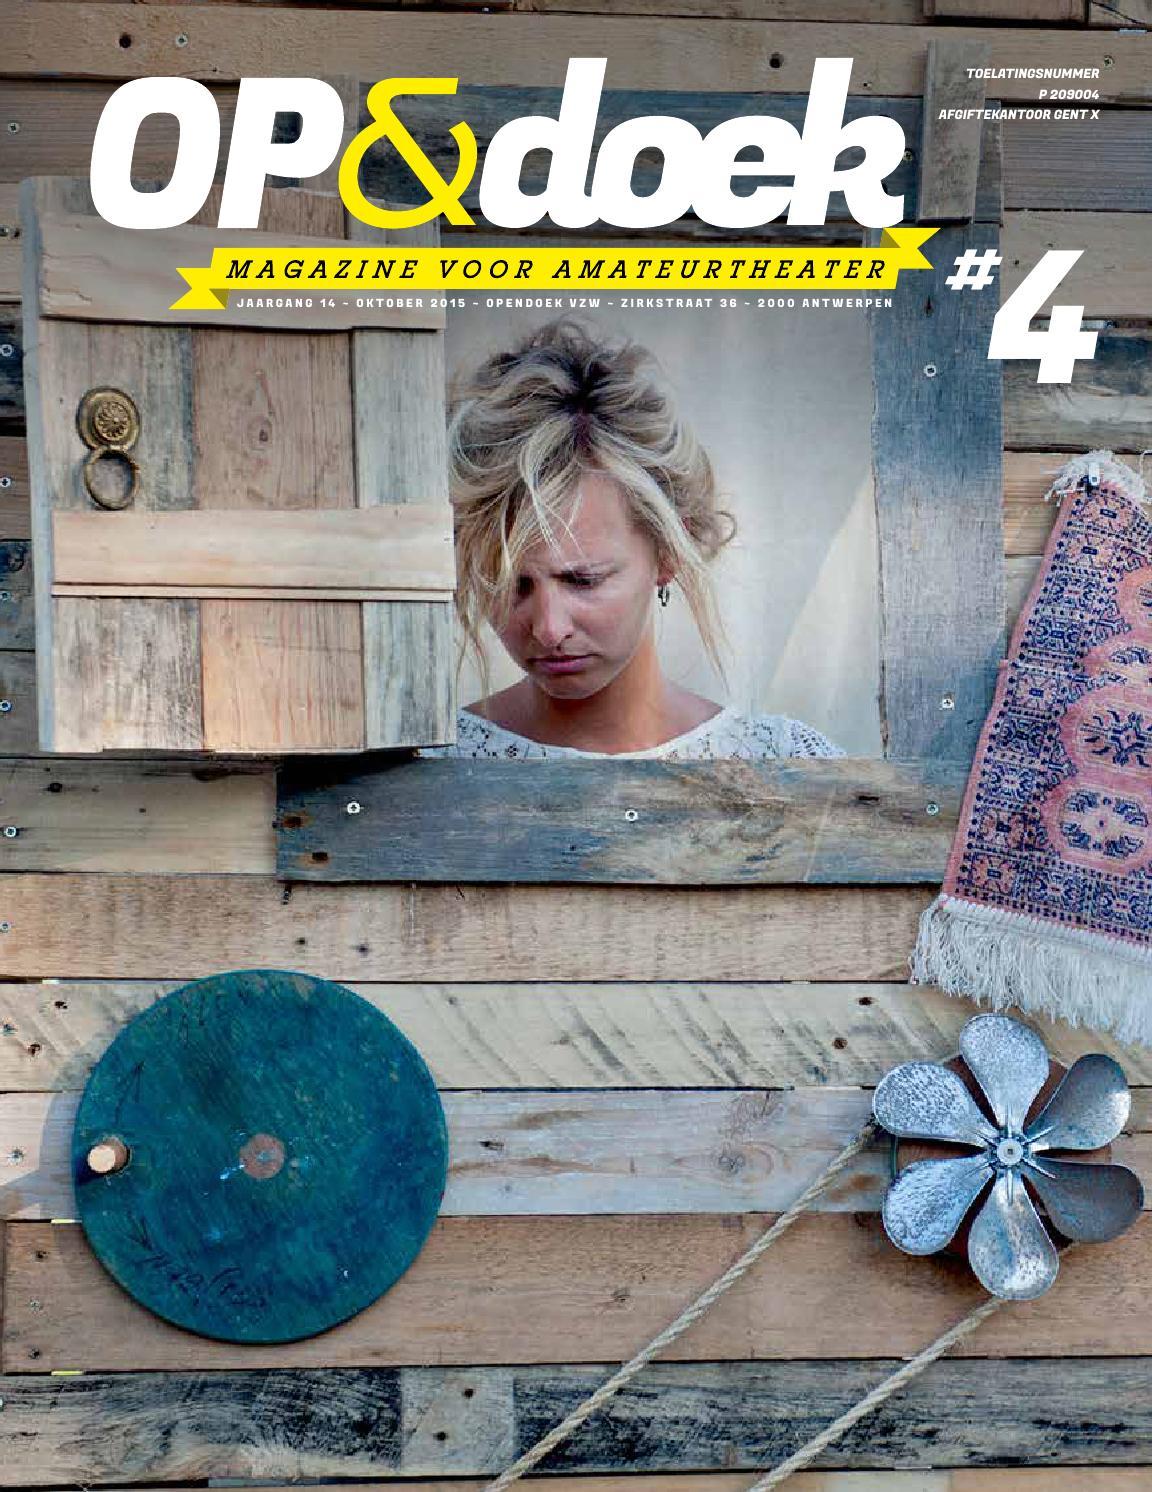 Magazine oktober 2015 by Hendrik Ramaker - issuu